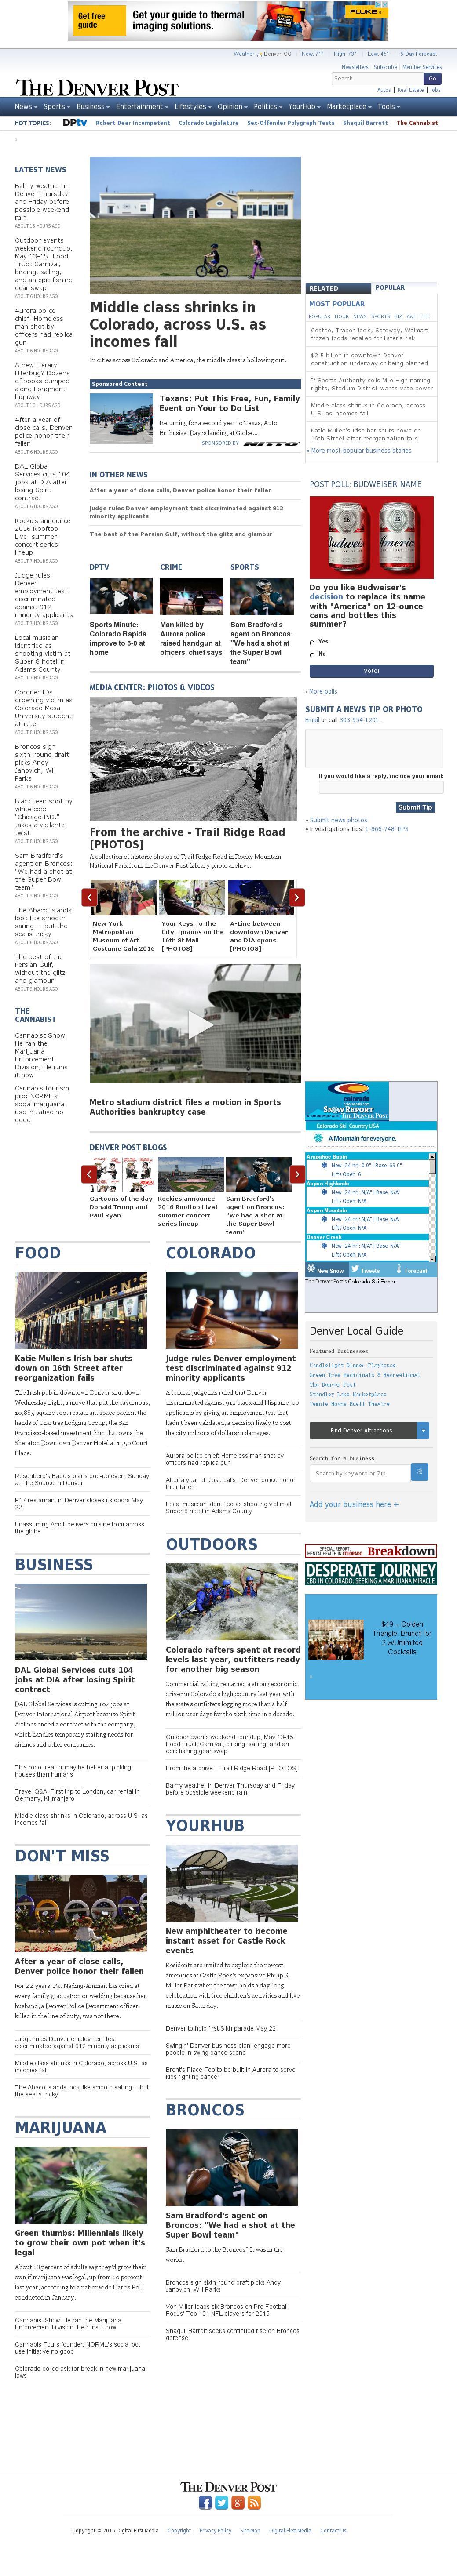 Denver Post at Thursday May 12, 2016, 10:04 p.m. UTC